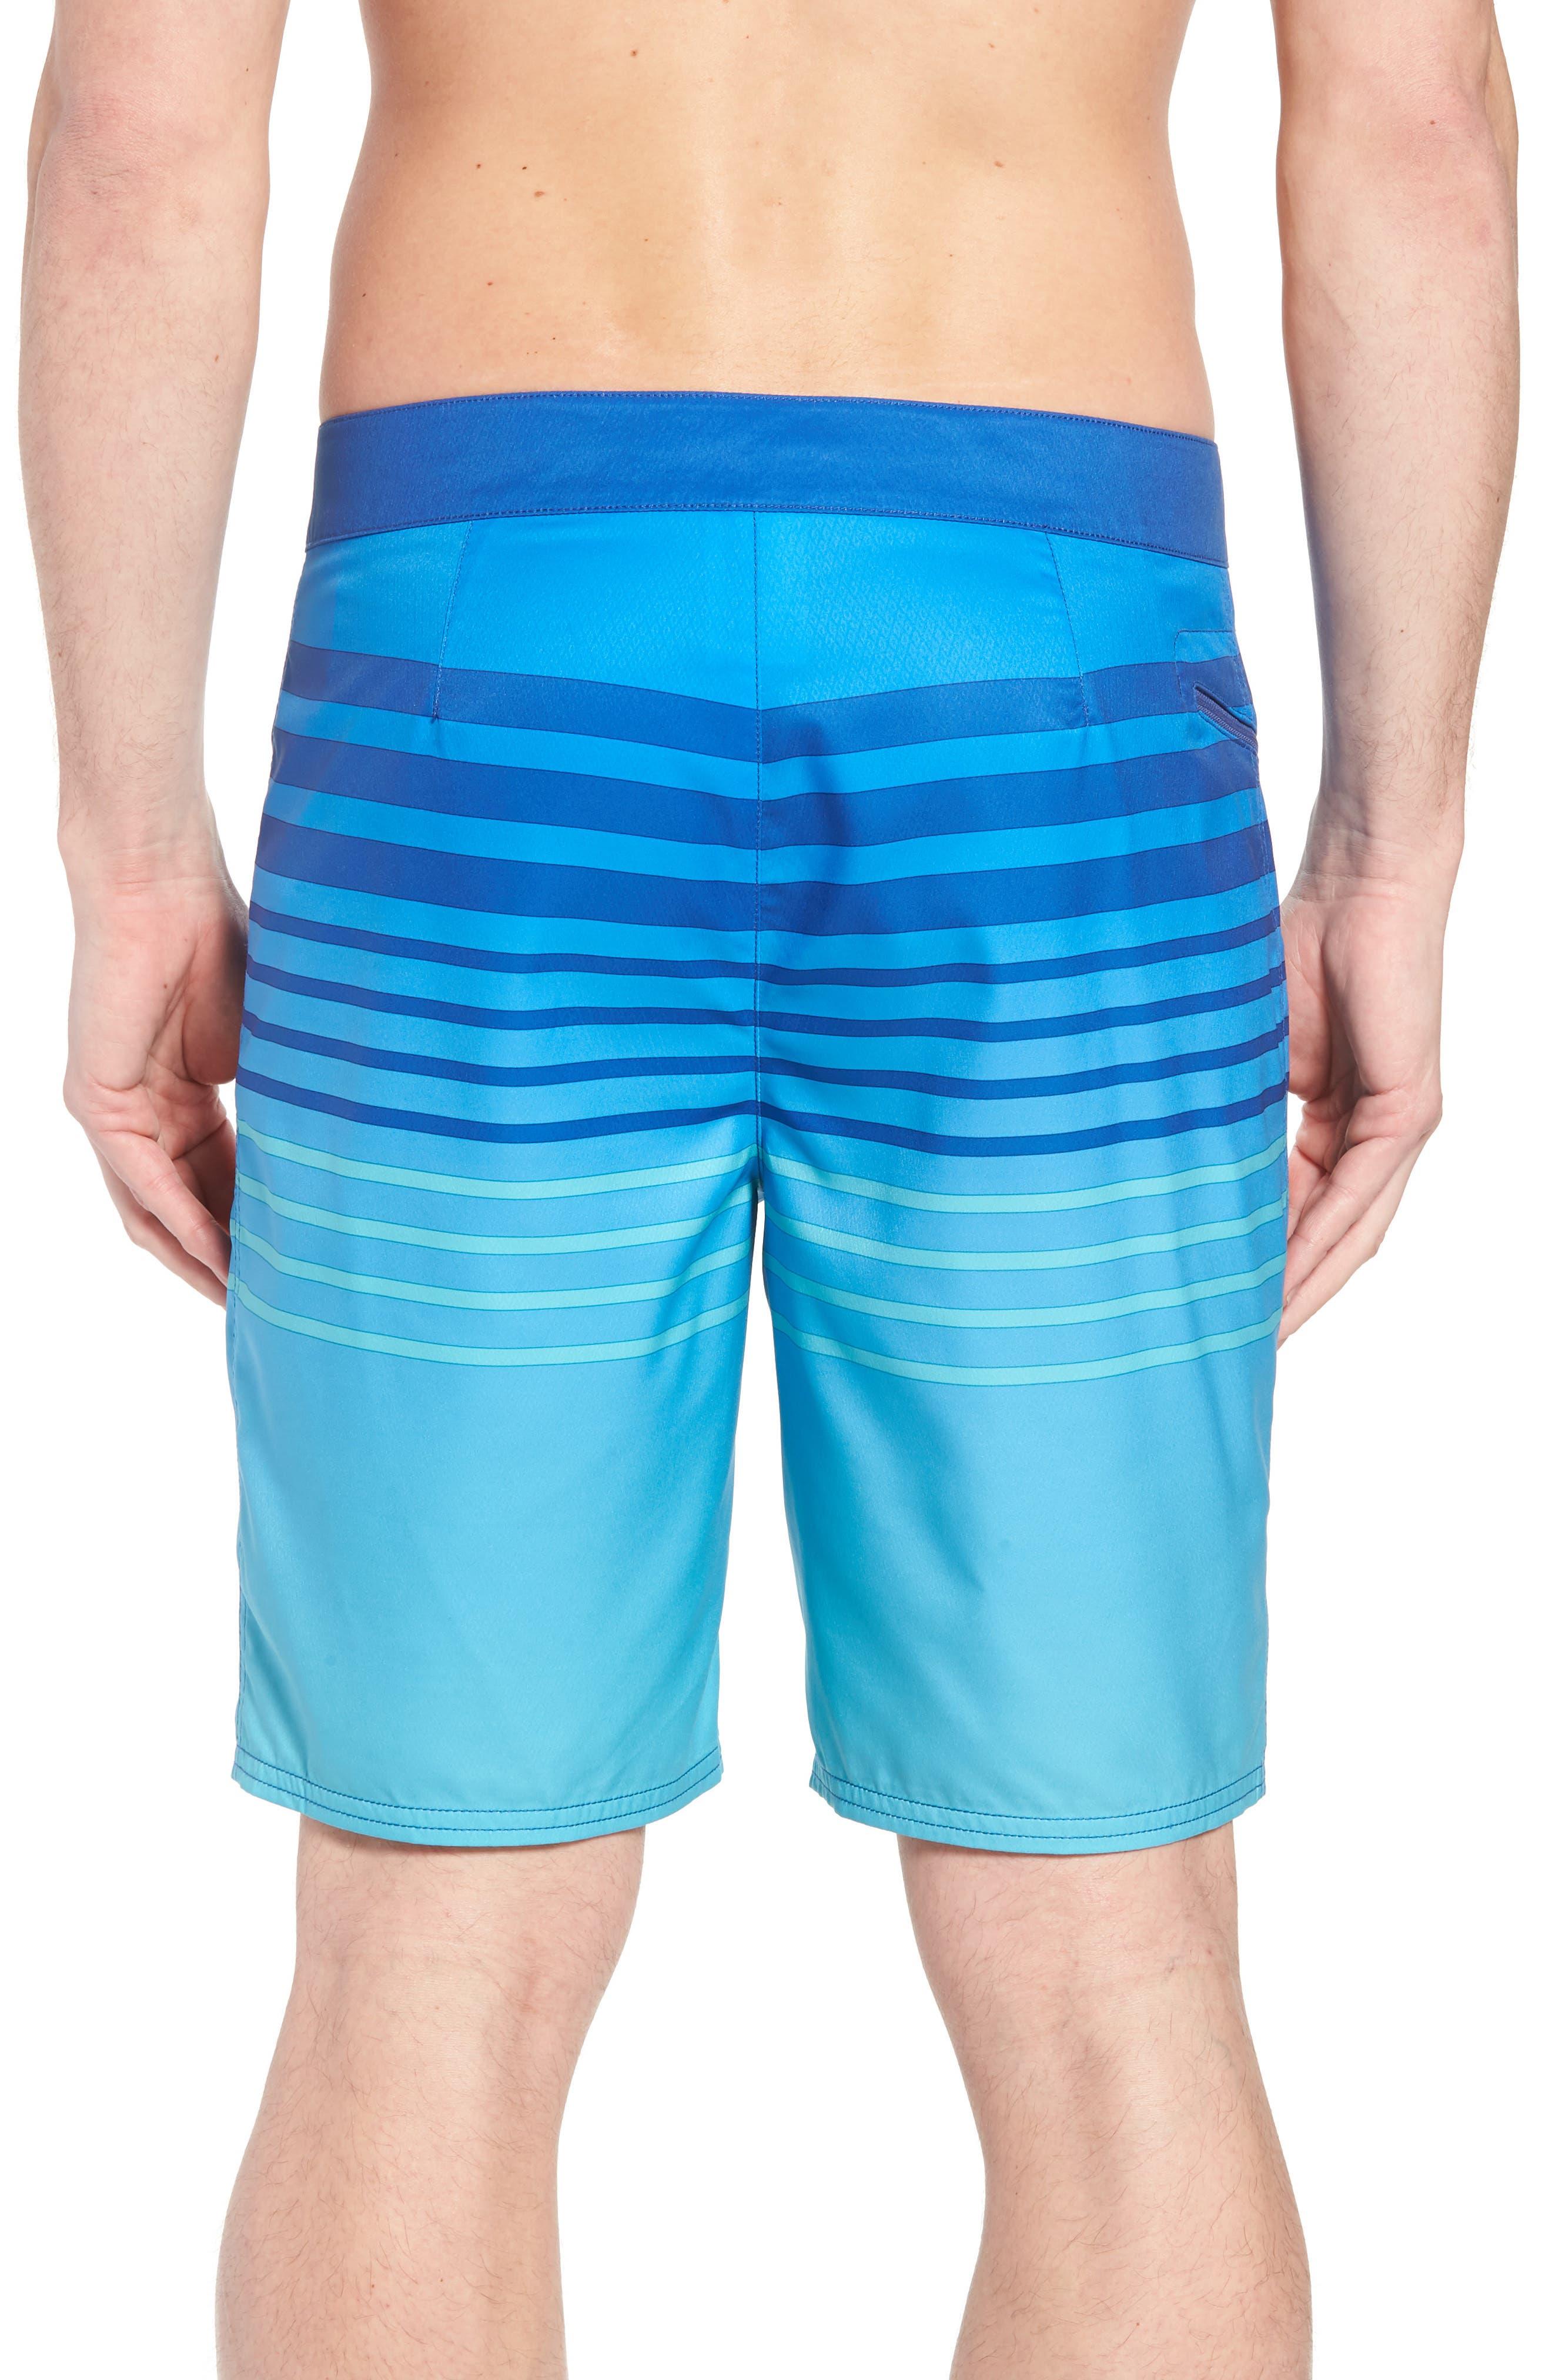 Surflodge Stripe Board Shorts,                             Alternate thumbnail 2, color,                             359